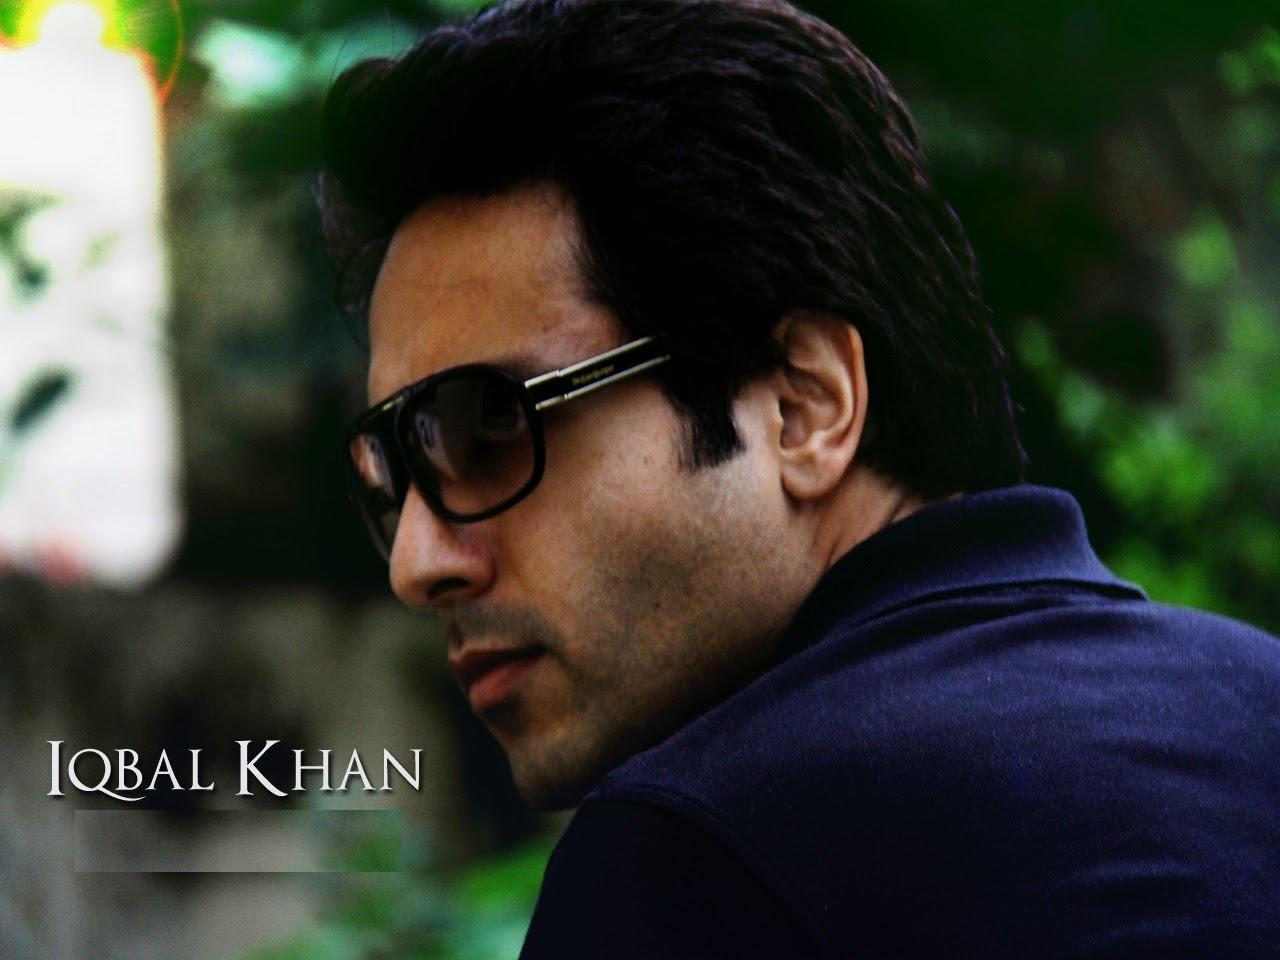 Iqbal Khan HD Wallpapers Free Download